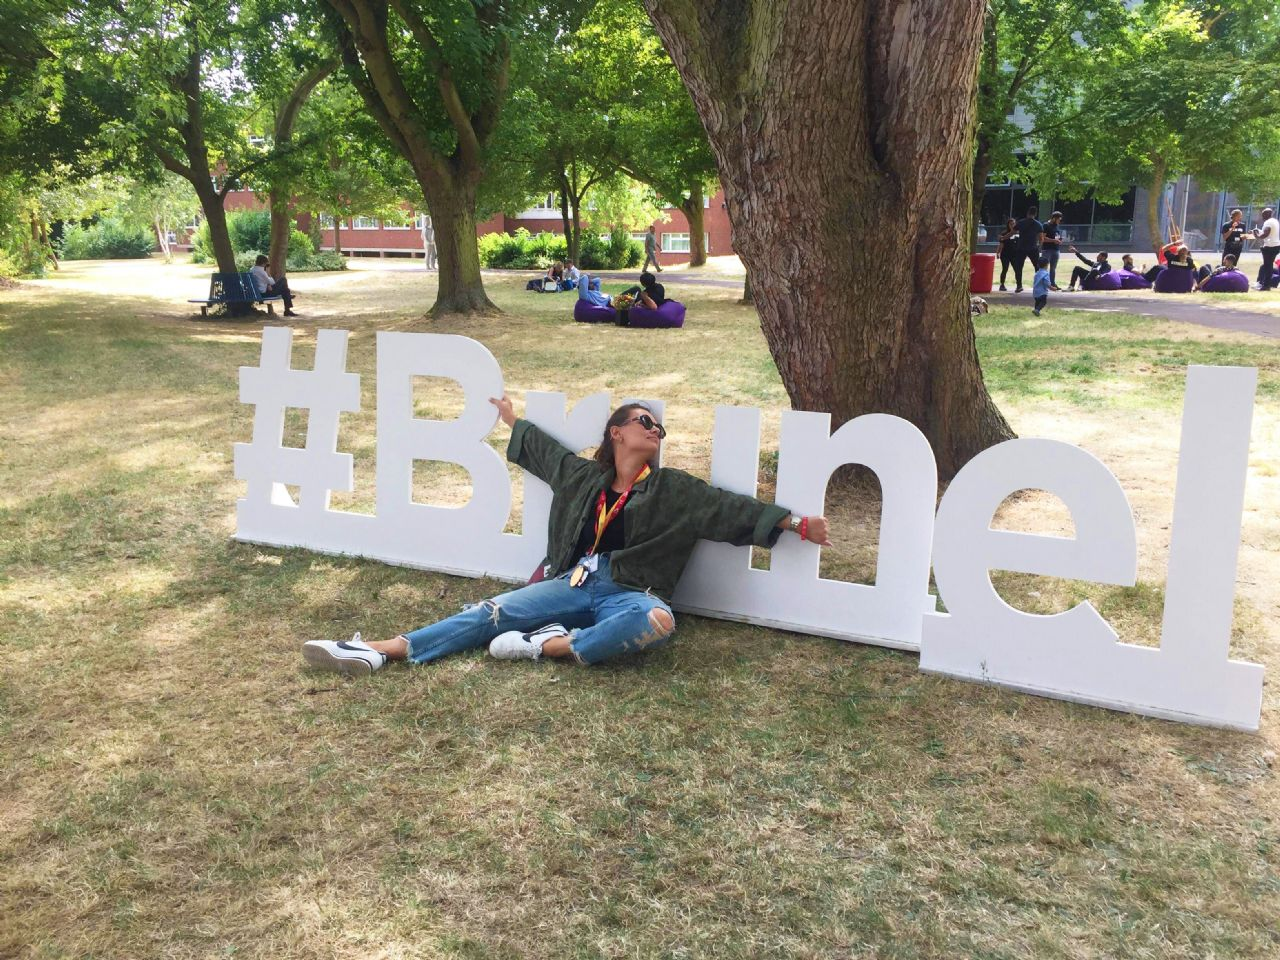 Hertfordshire incontri agenzie Free online dating mondi virtuali